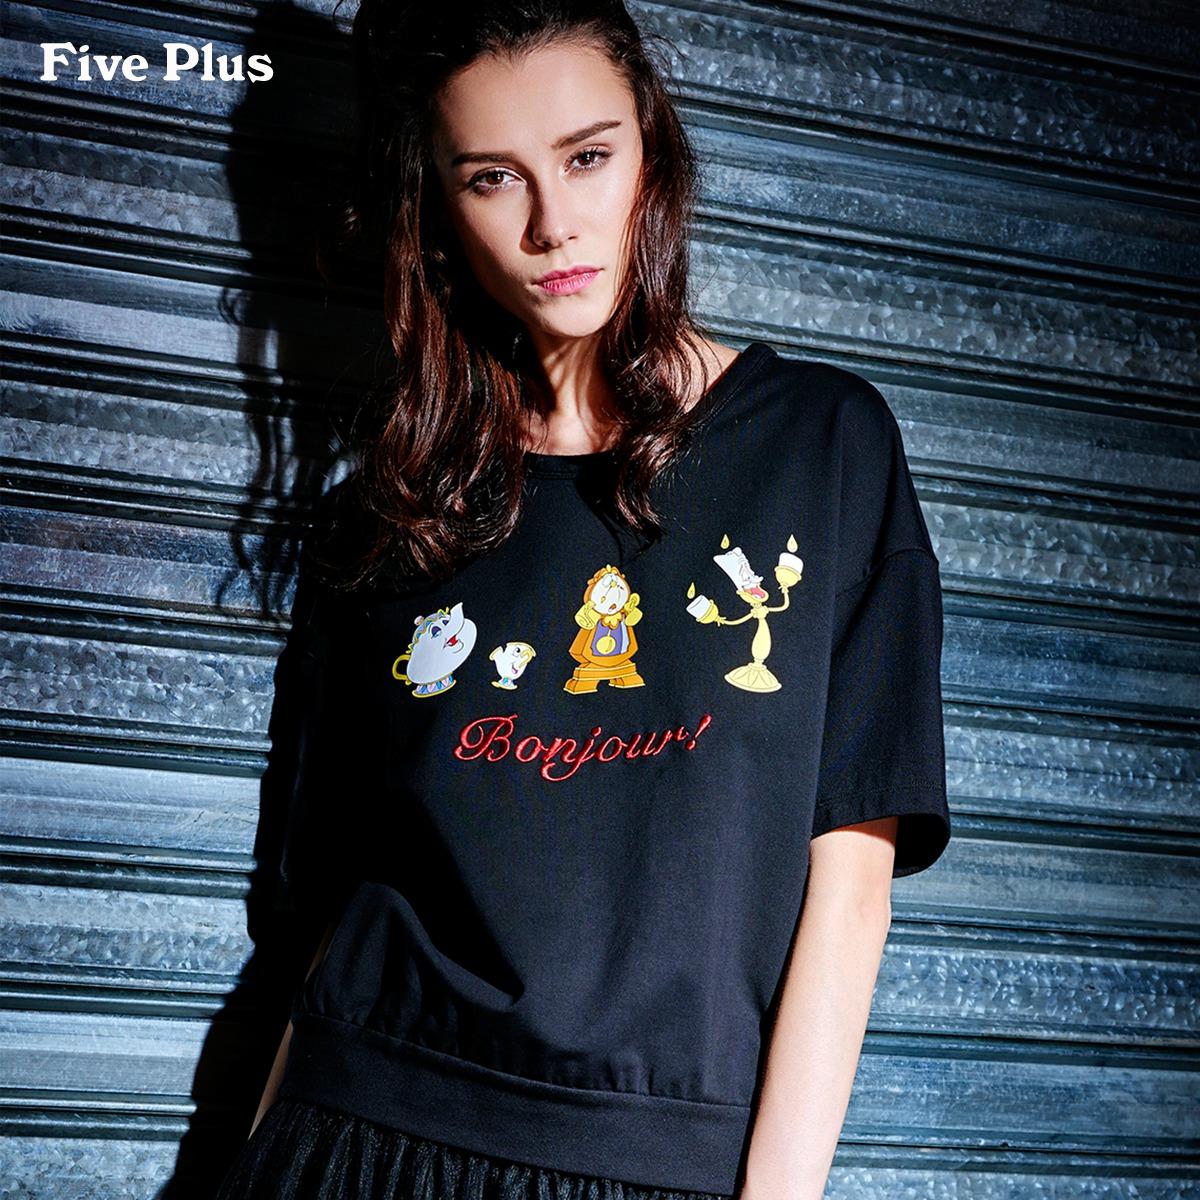 Five Plus新女夏装迪士尼美女与野兽棉质图案短袖T恤2JF1025740